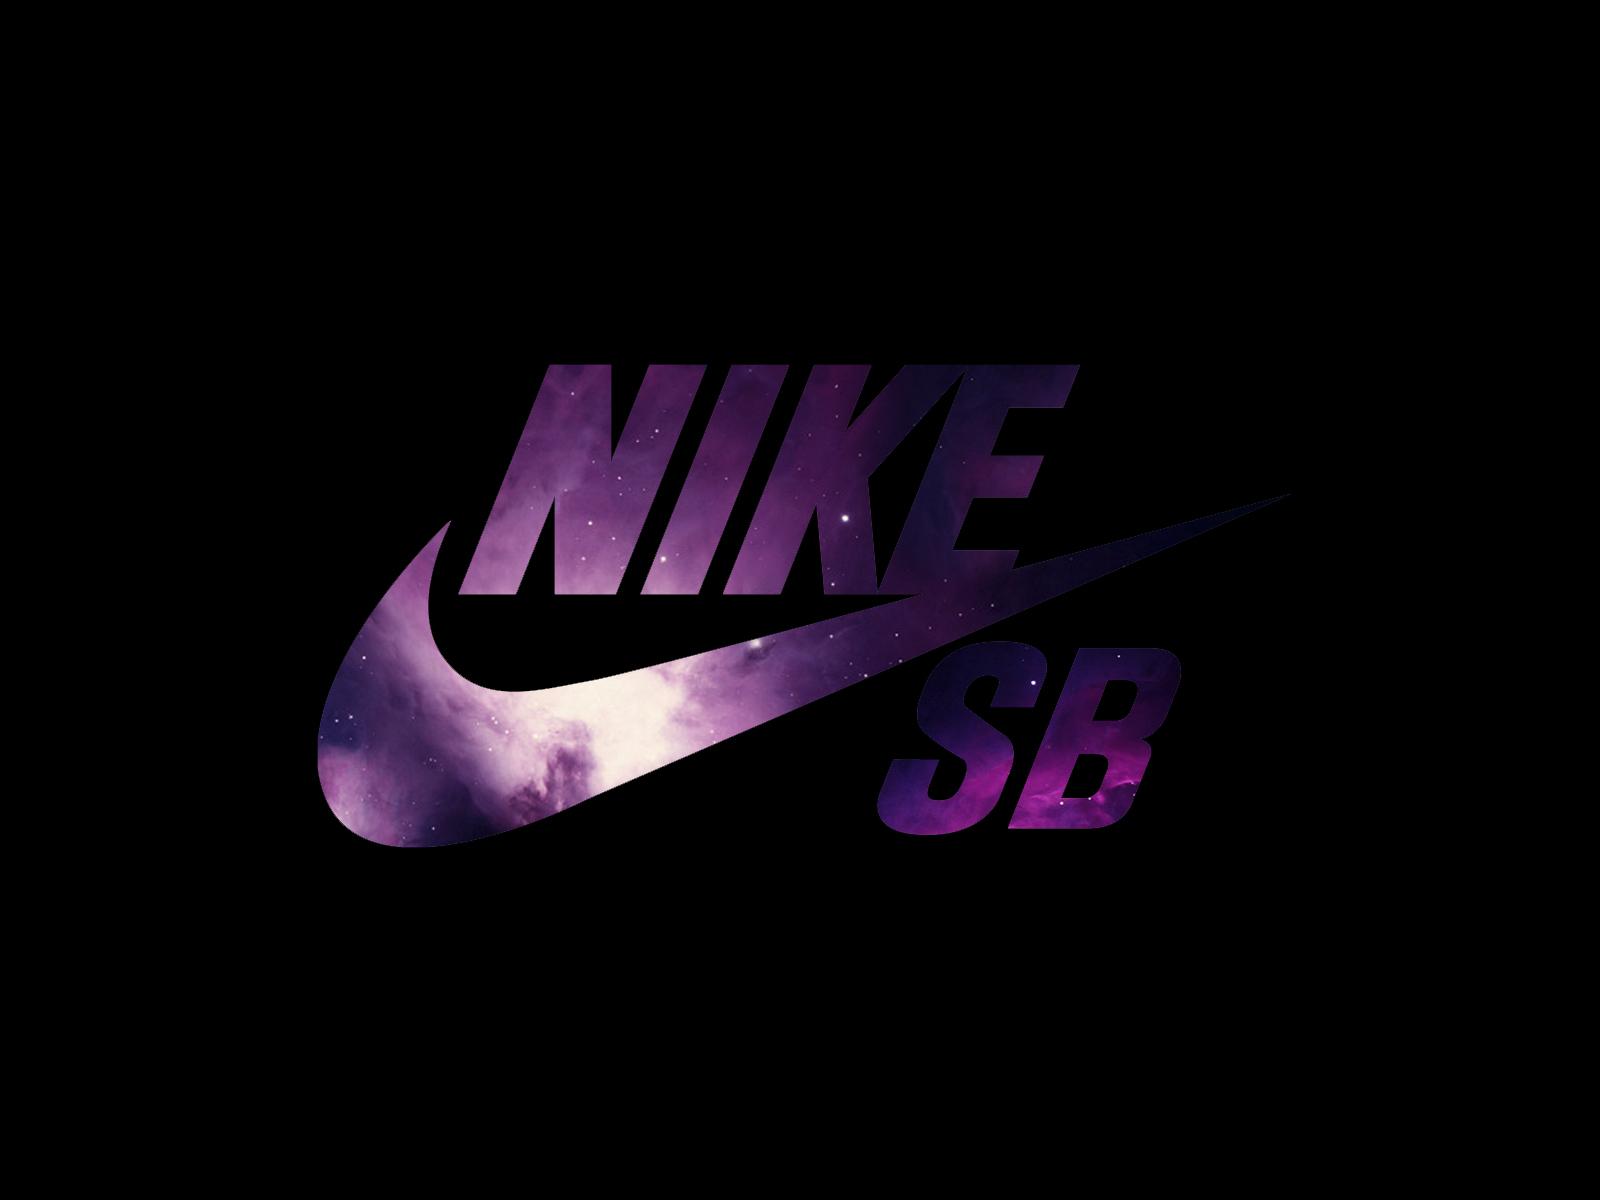 Nike just do it logo iphone wallpaper download roblox - Wallpapers Nike Desktop Wallpapers Wallpapers Hd Wallpaper Hd Nike 2